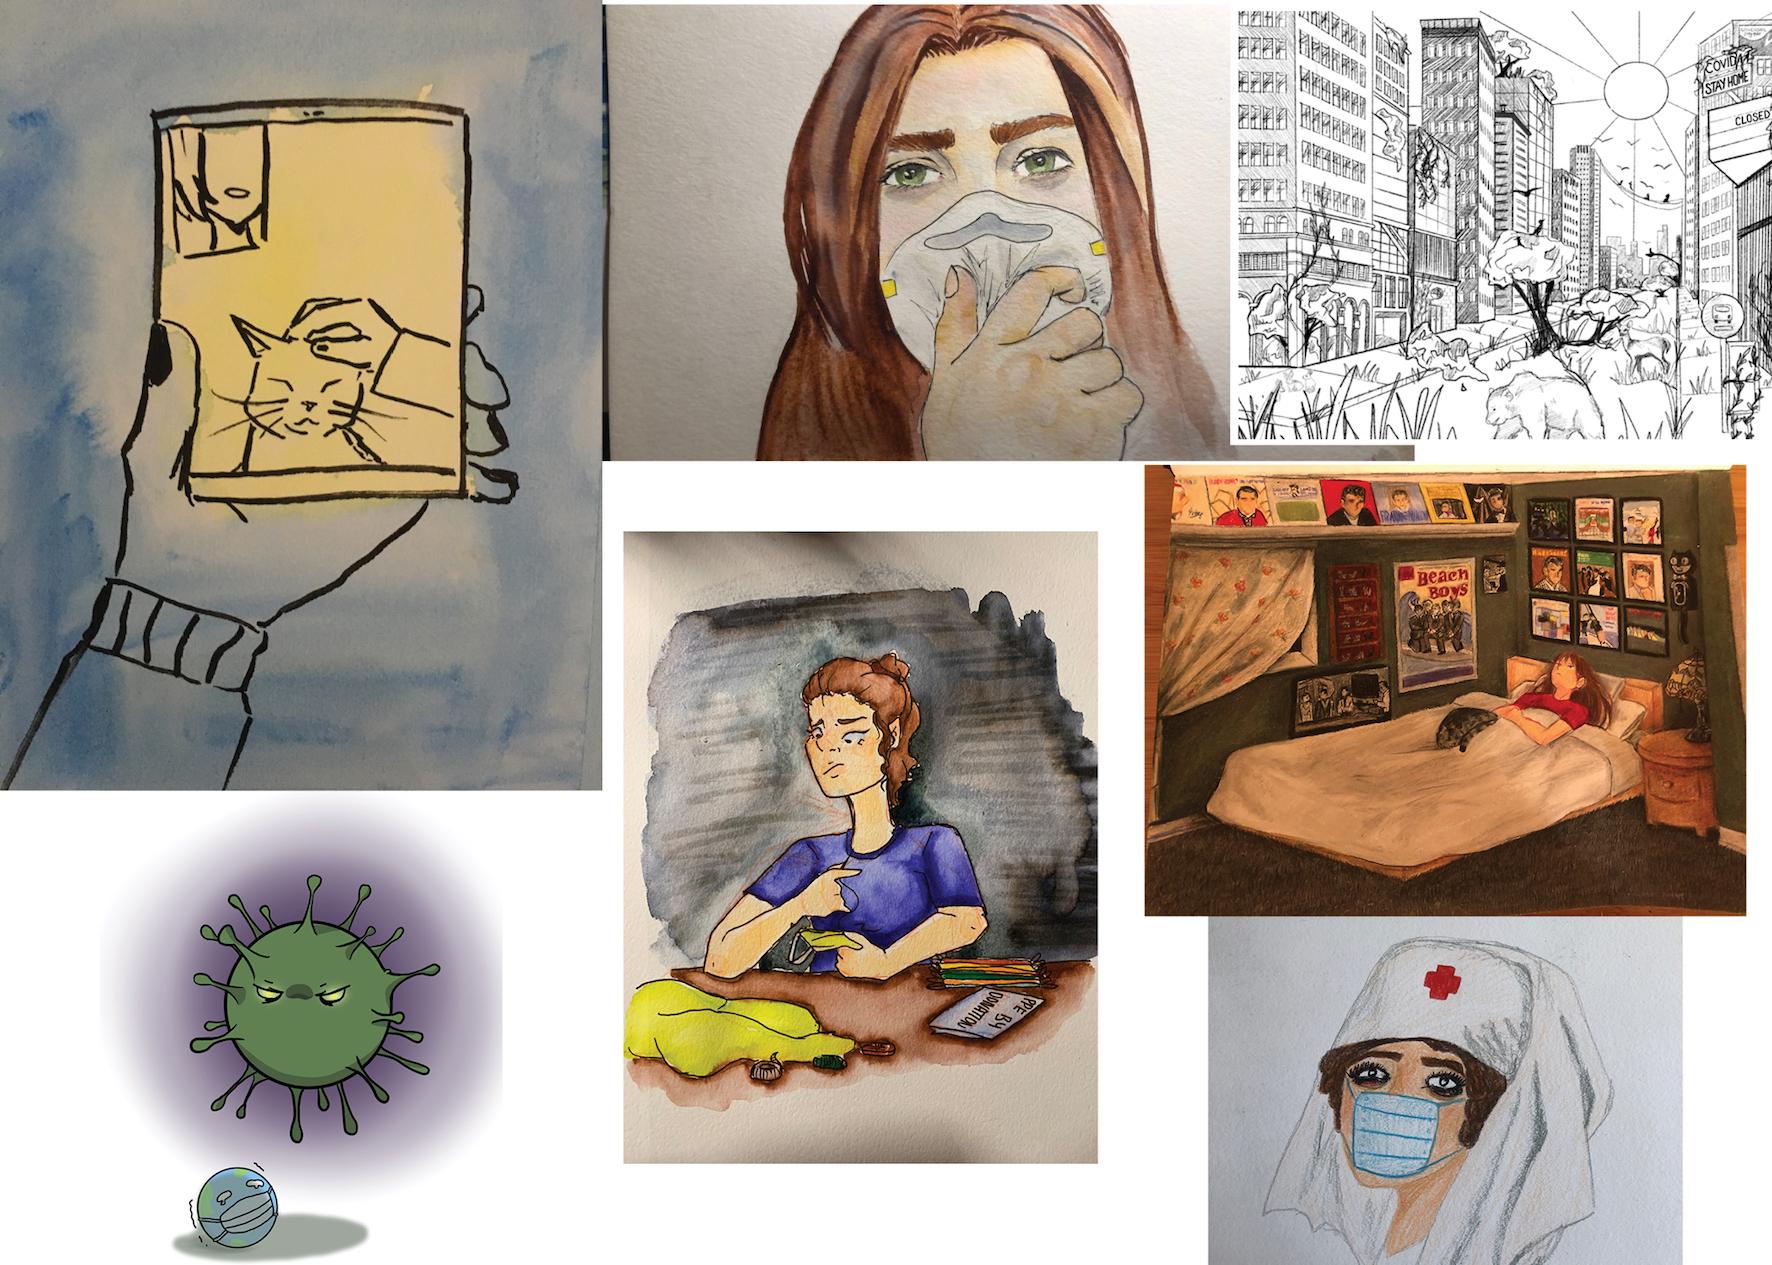 Students' (Kelly Palm, Abby Ridd , Chara Chen, Vivian Selmes, Yvonne Cao, Aila Brampton) COVID-19 art project created in Elphinstone Art Teacher Ellory Robertson's class.